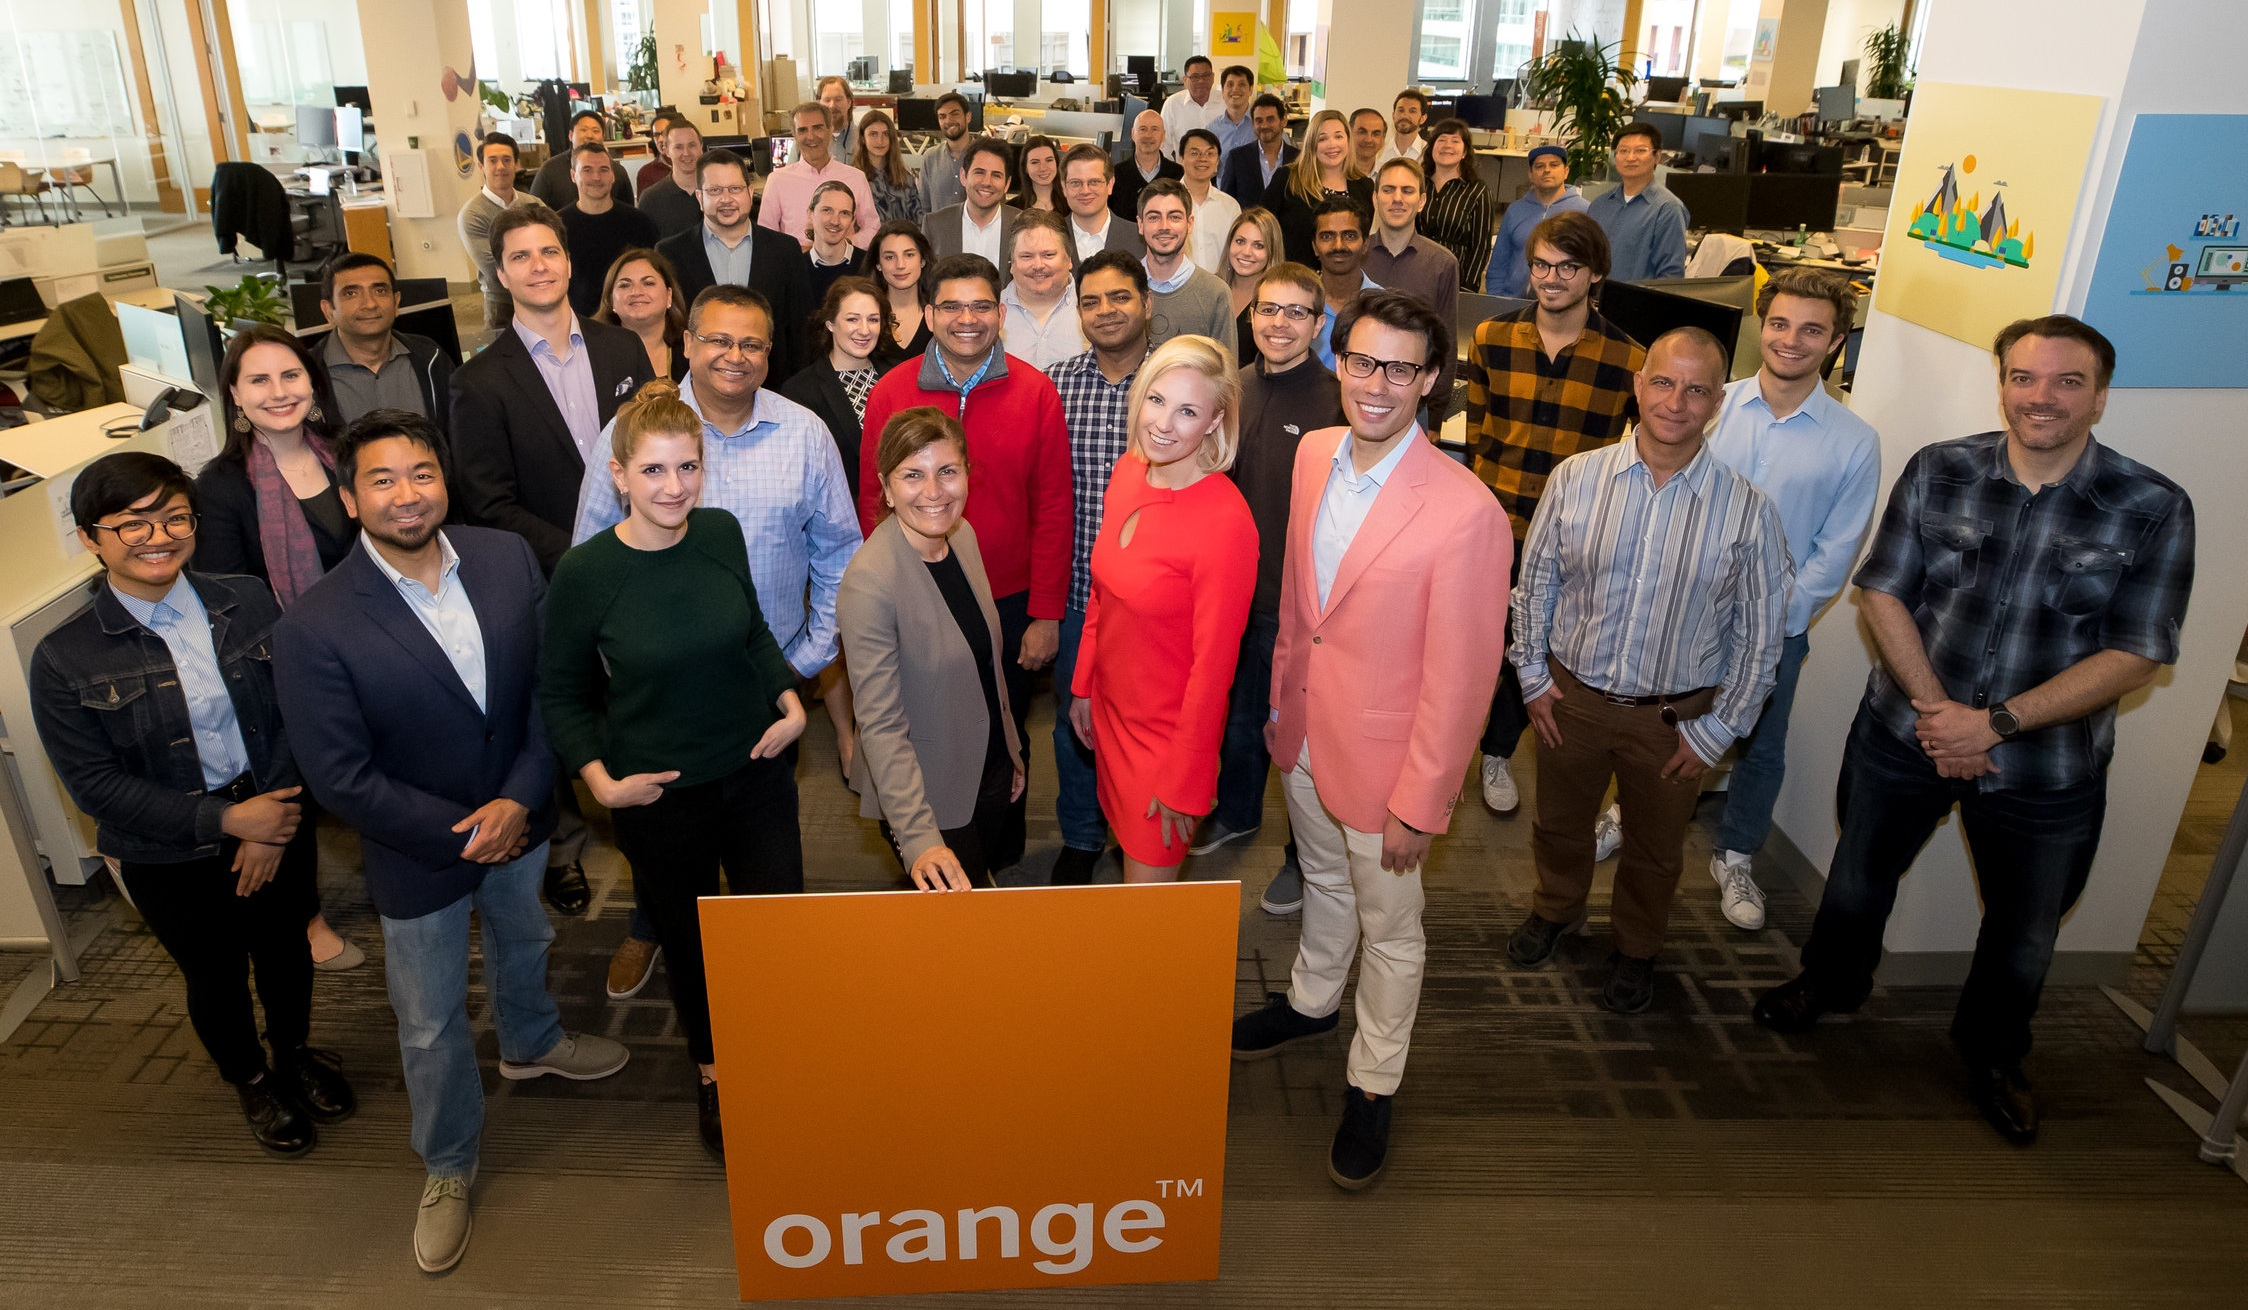 5.7.19+Orange+SV+Group+Photo+and+Office+Photos-10.jpg